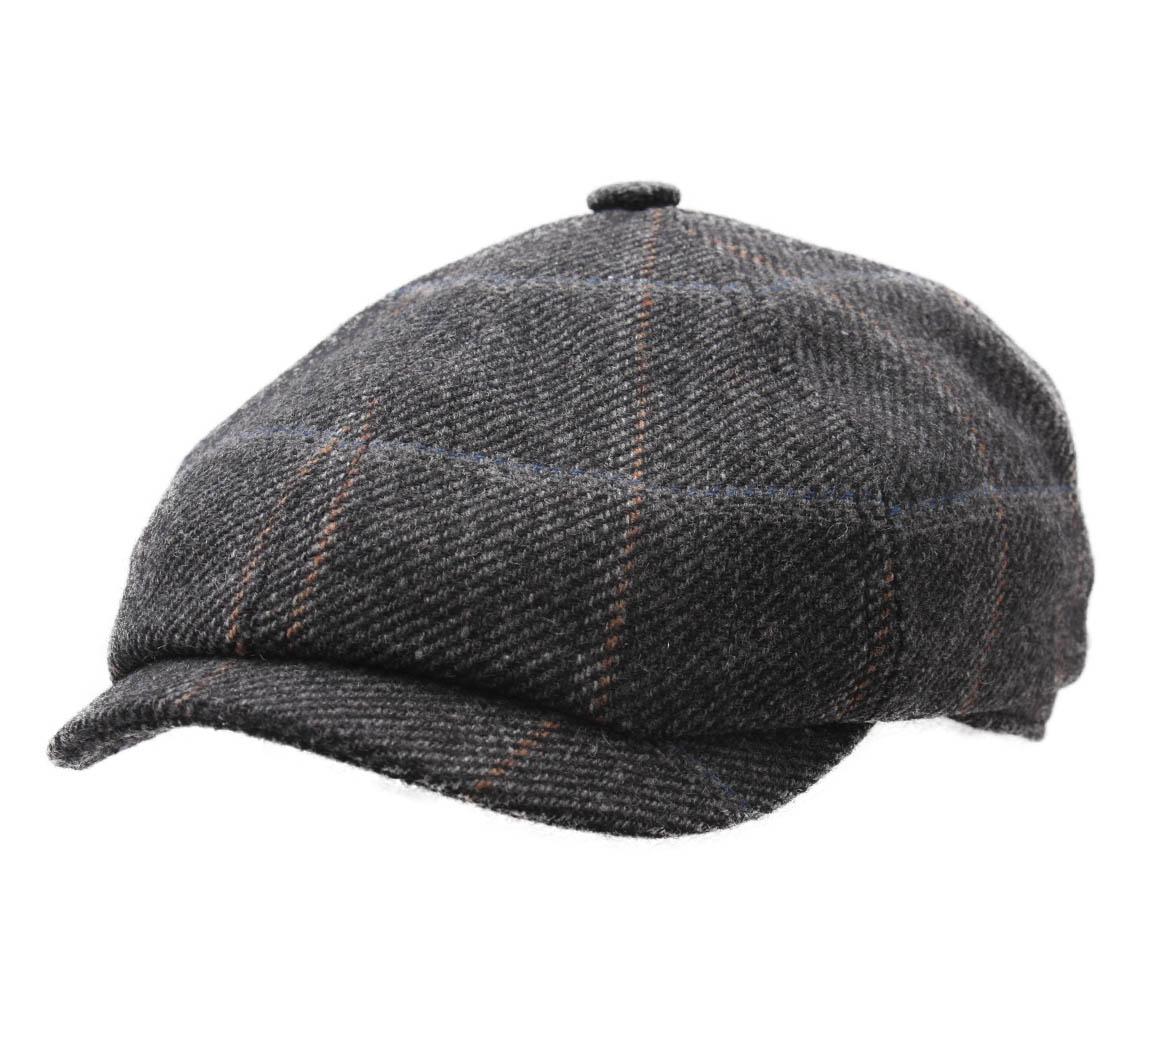 casquette plate b ret homme oregon wool casquette stetson. Black Bedroom Furniture Sets. Home Design Ideas